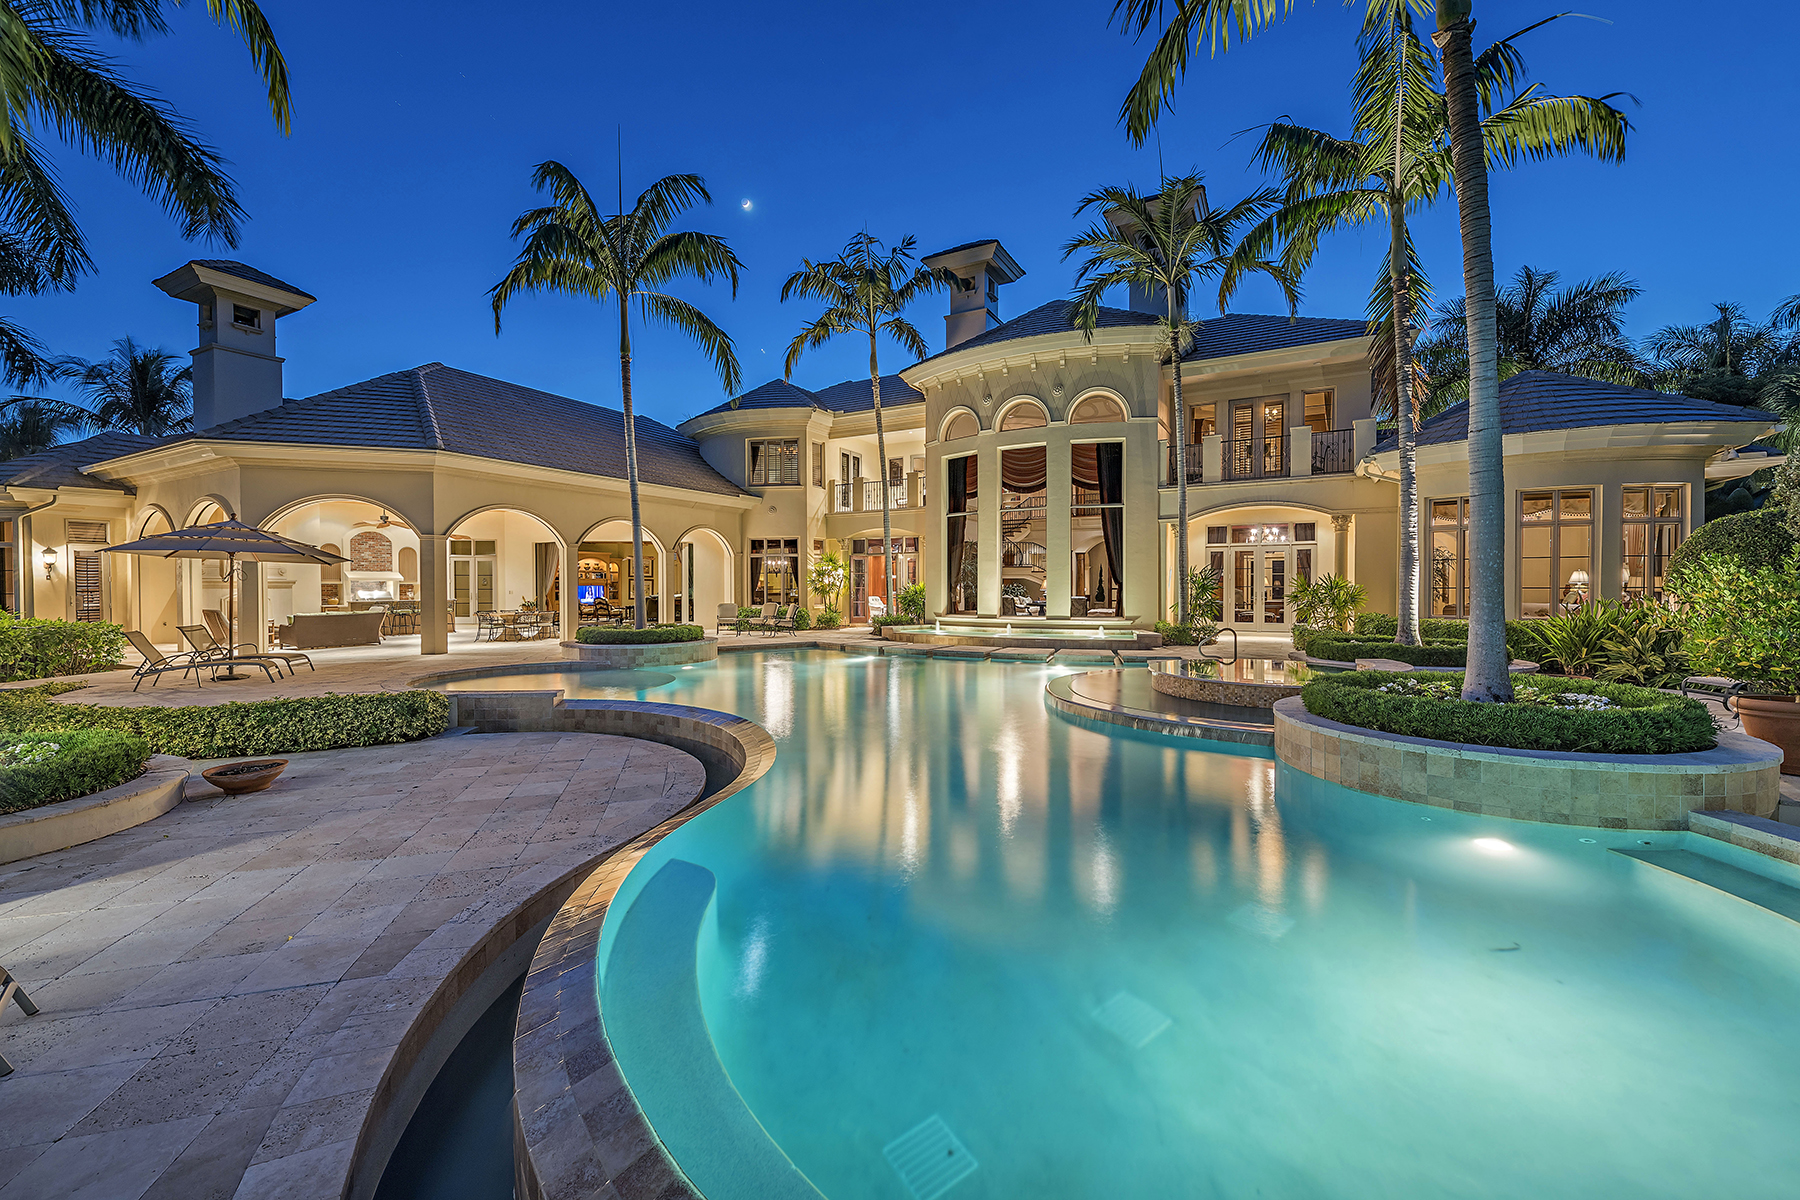 Single Family Home for Sale at 1420 Nighthawk Pt , Naples, FL 34105 1420 Nighthawk Pt Estuary At Grey Oaks, Naples, Florida, 34105 United States